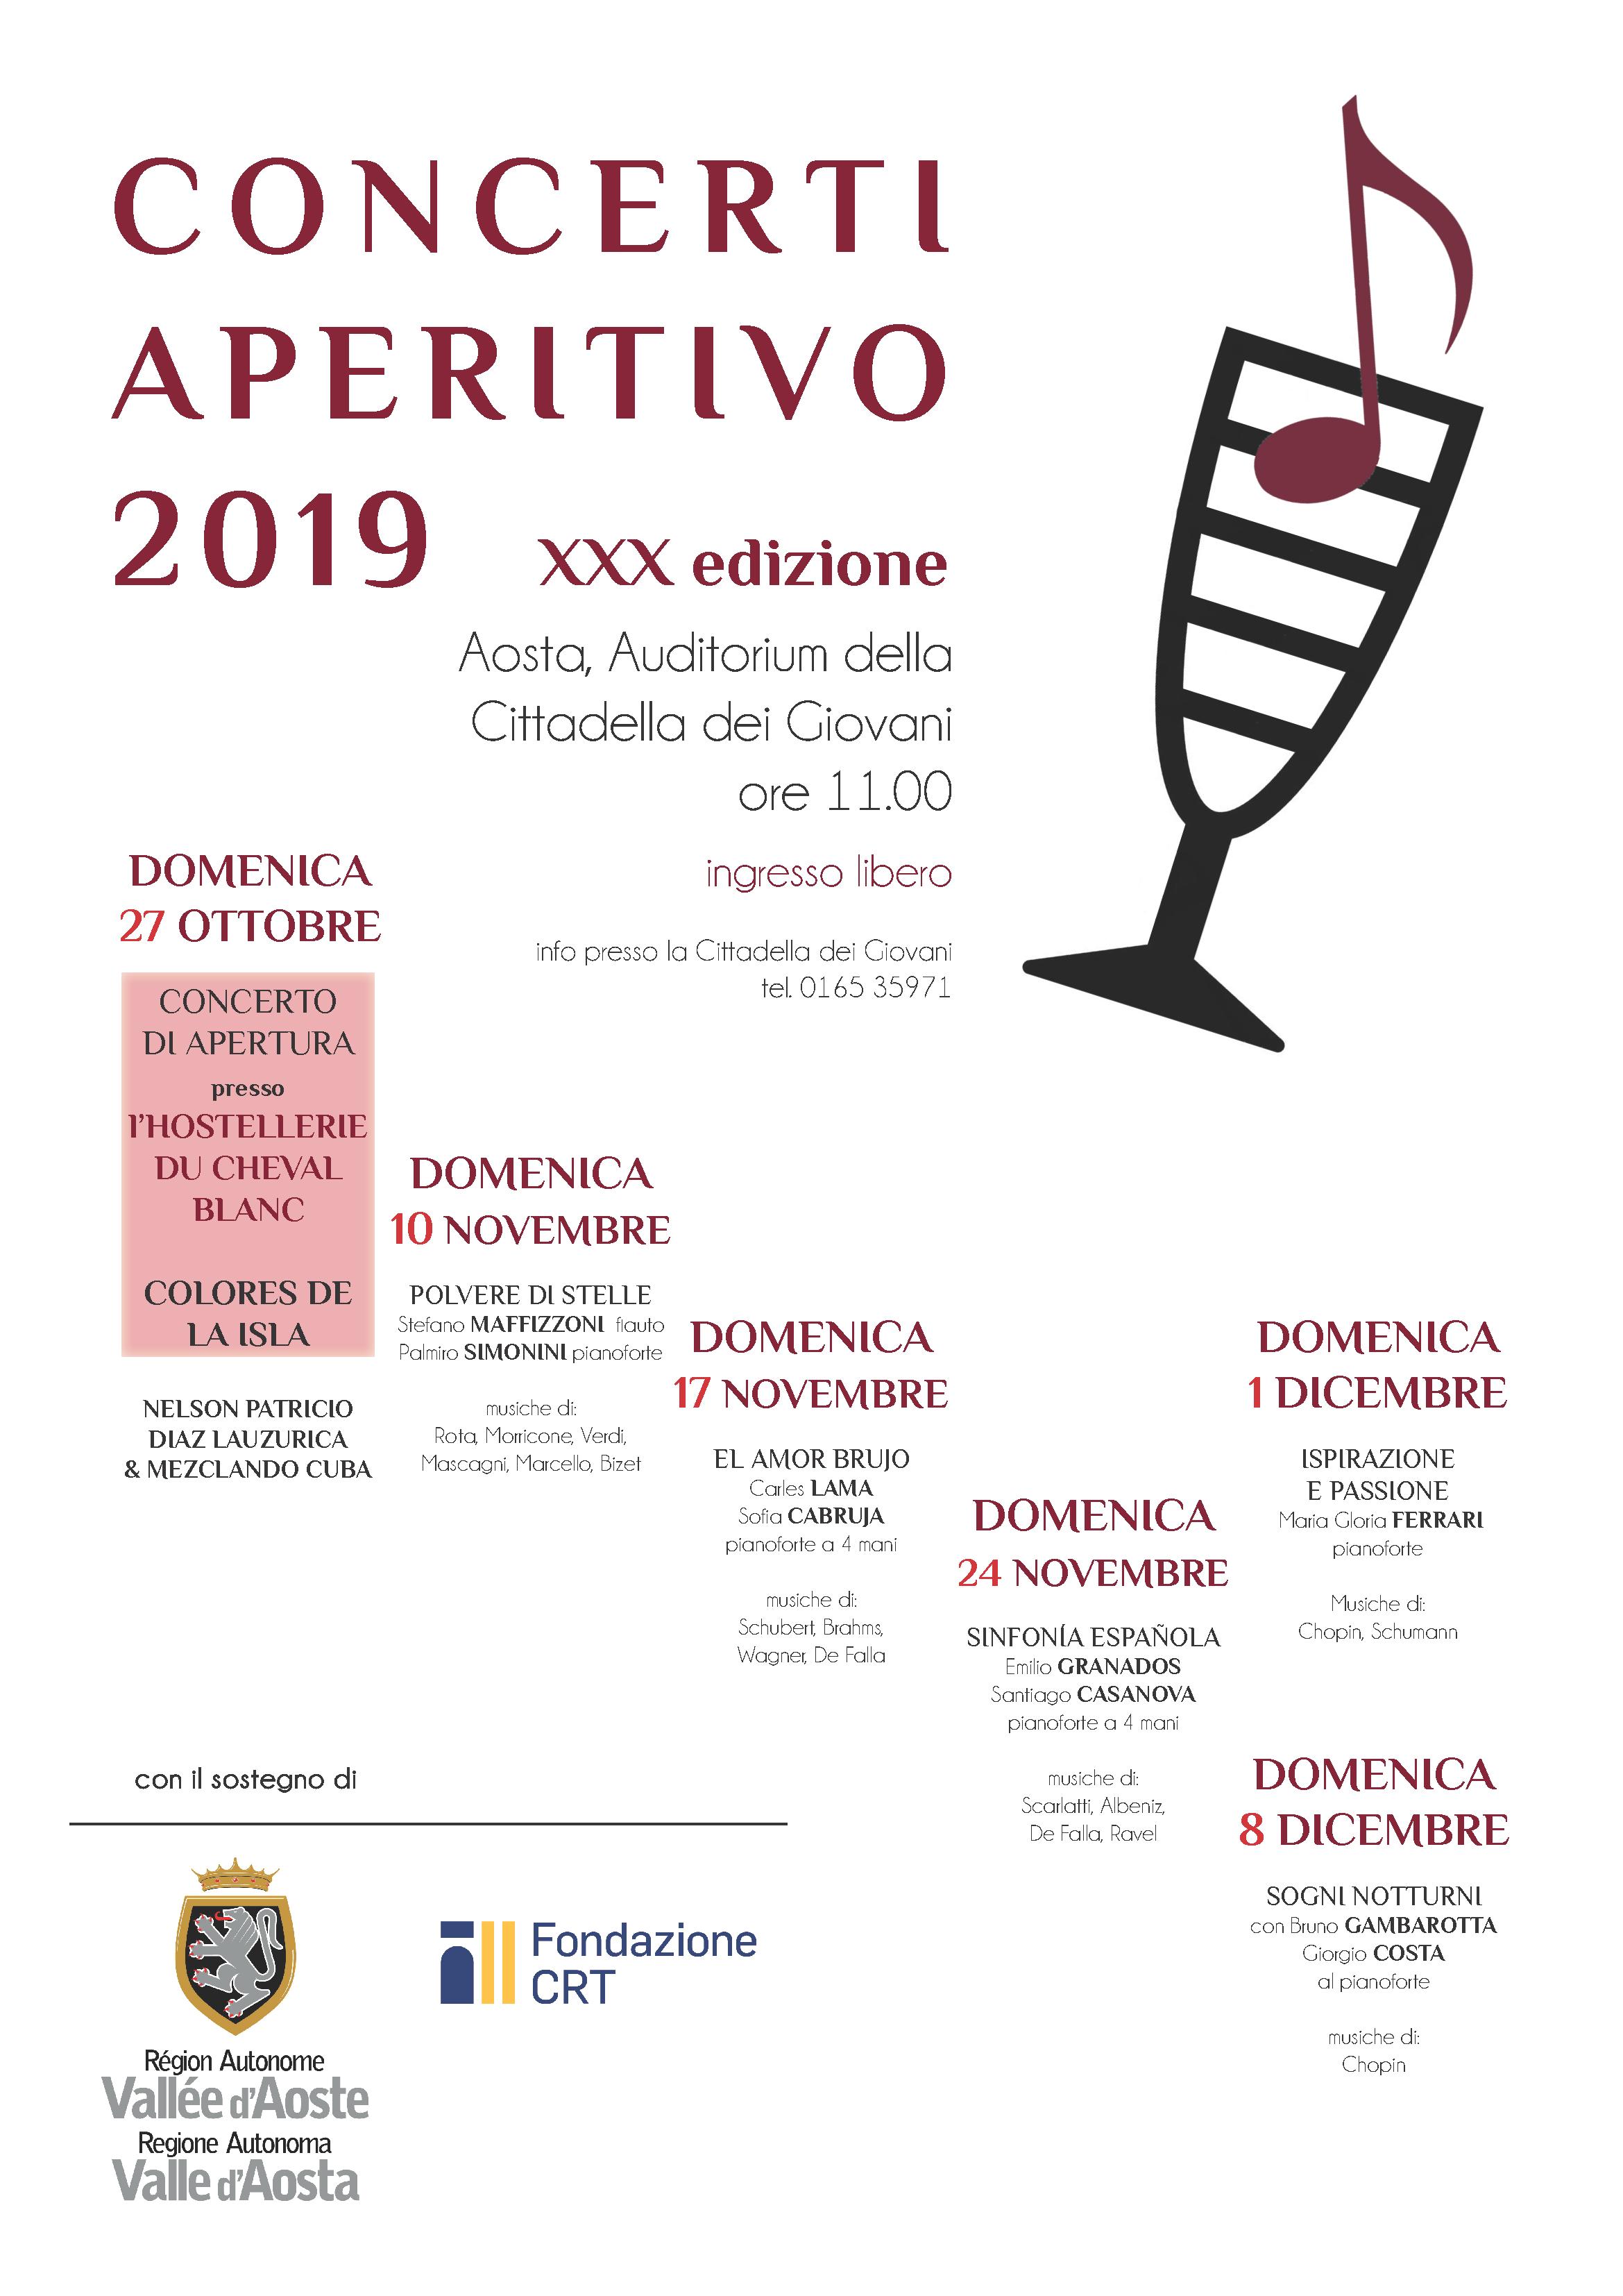 Concerto aperitivo Aosta 2019